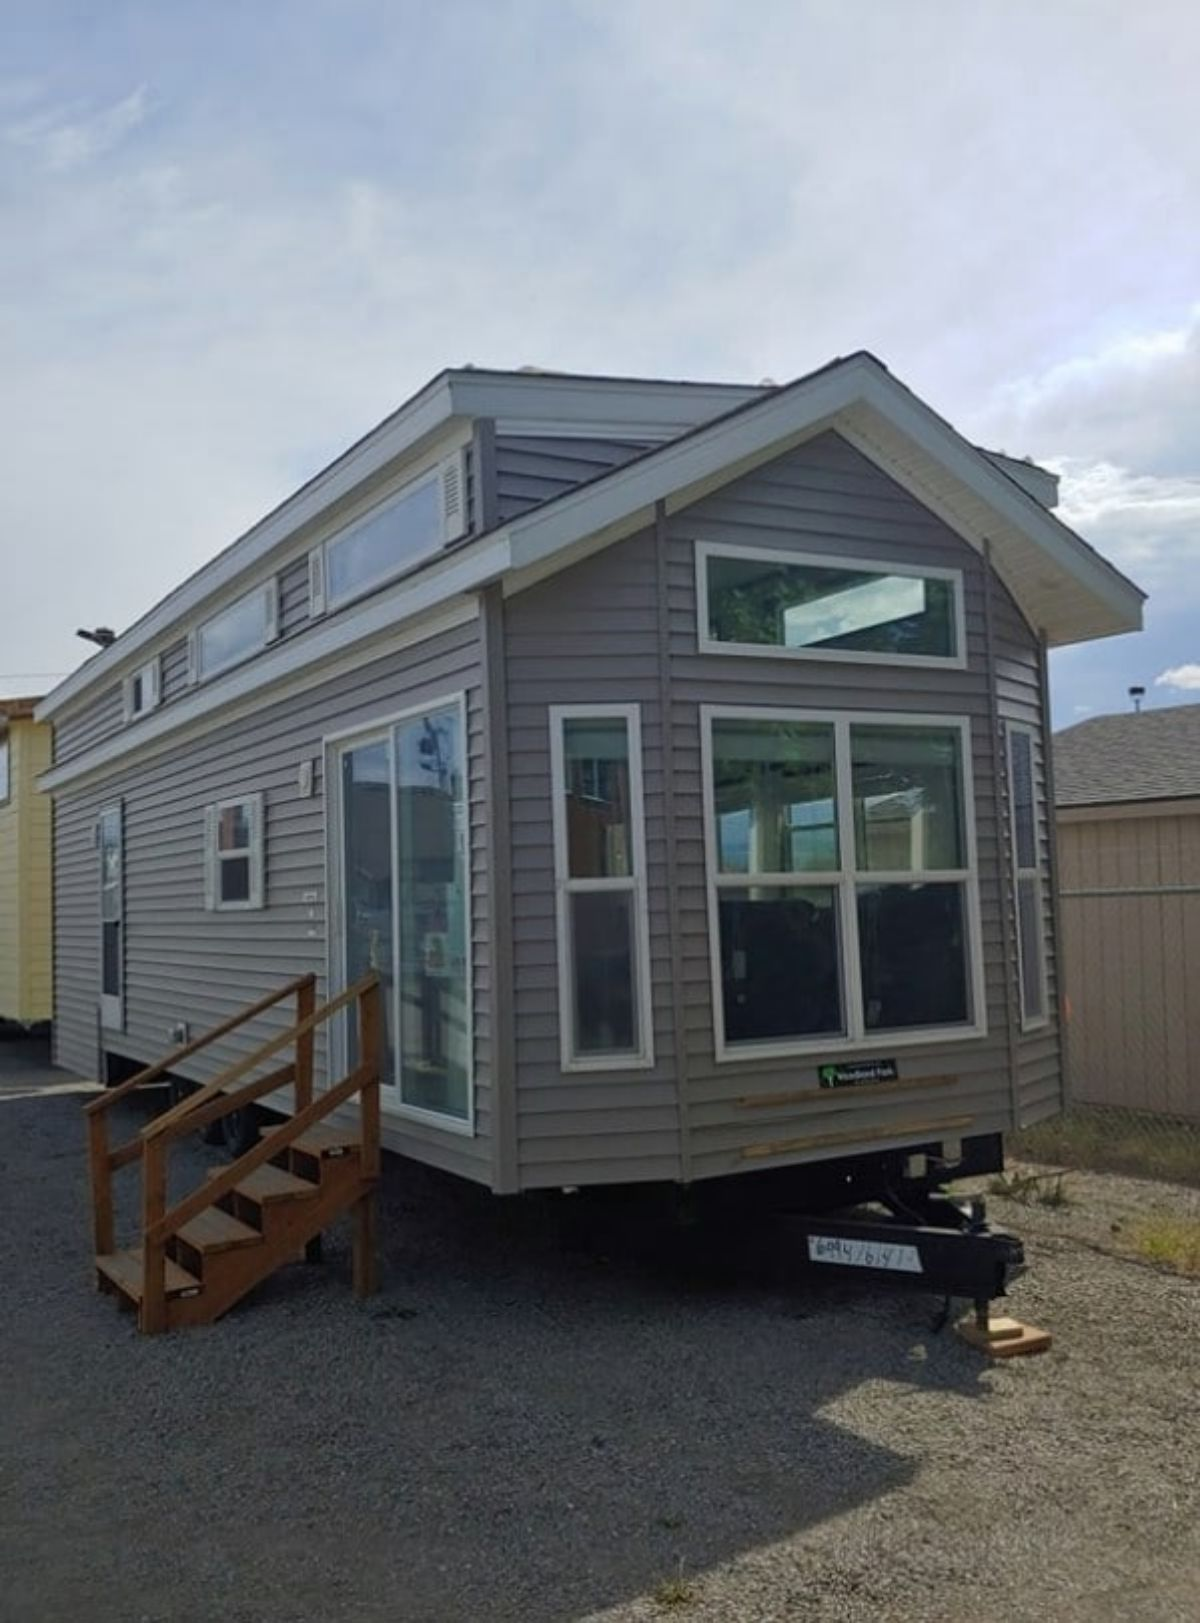 The Grand Teton Park Model Home